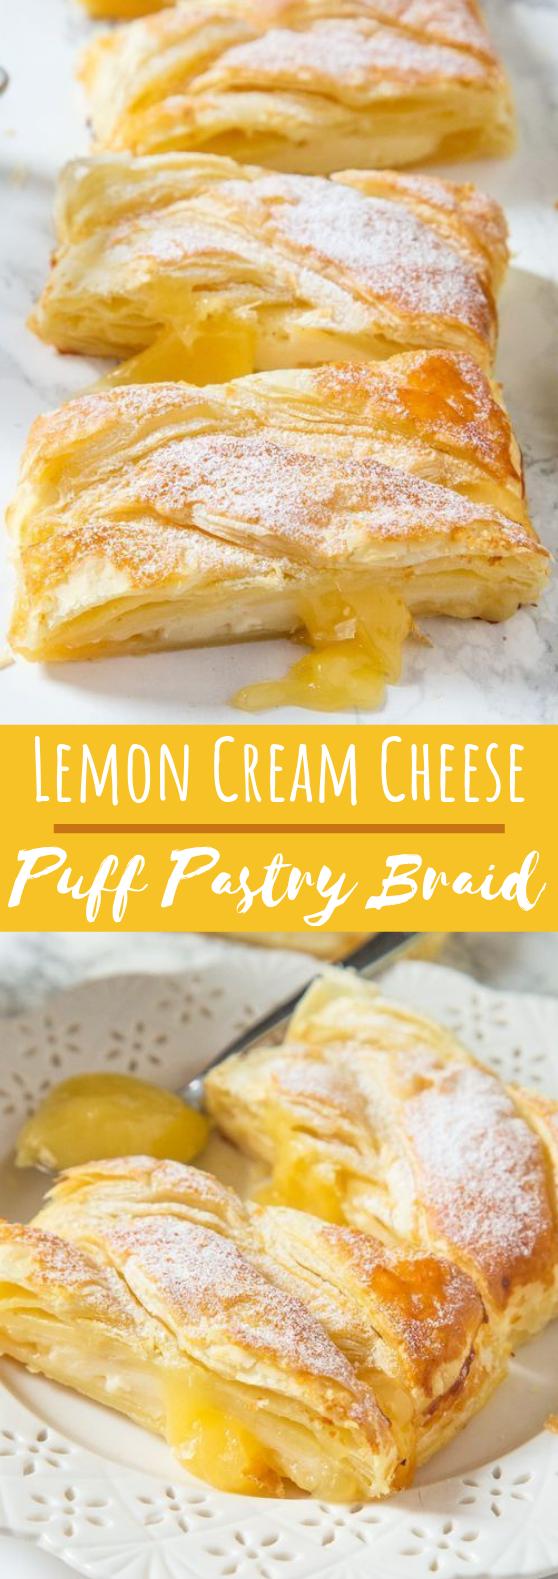 Lemon Cream Cheese Puff Pastry Braid #desserts #recipes